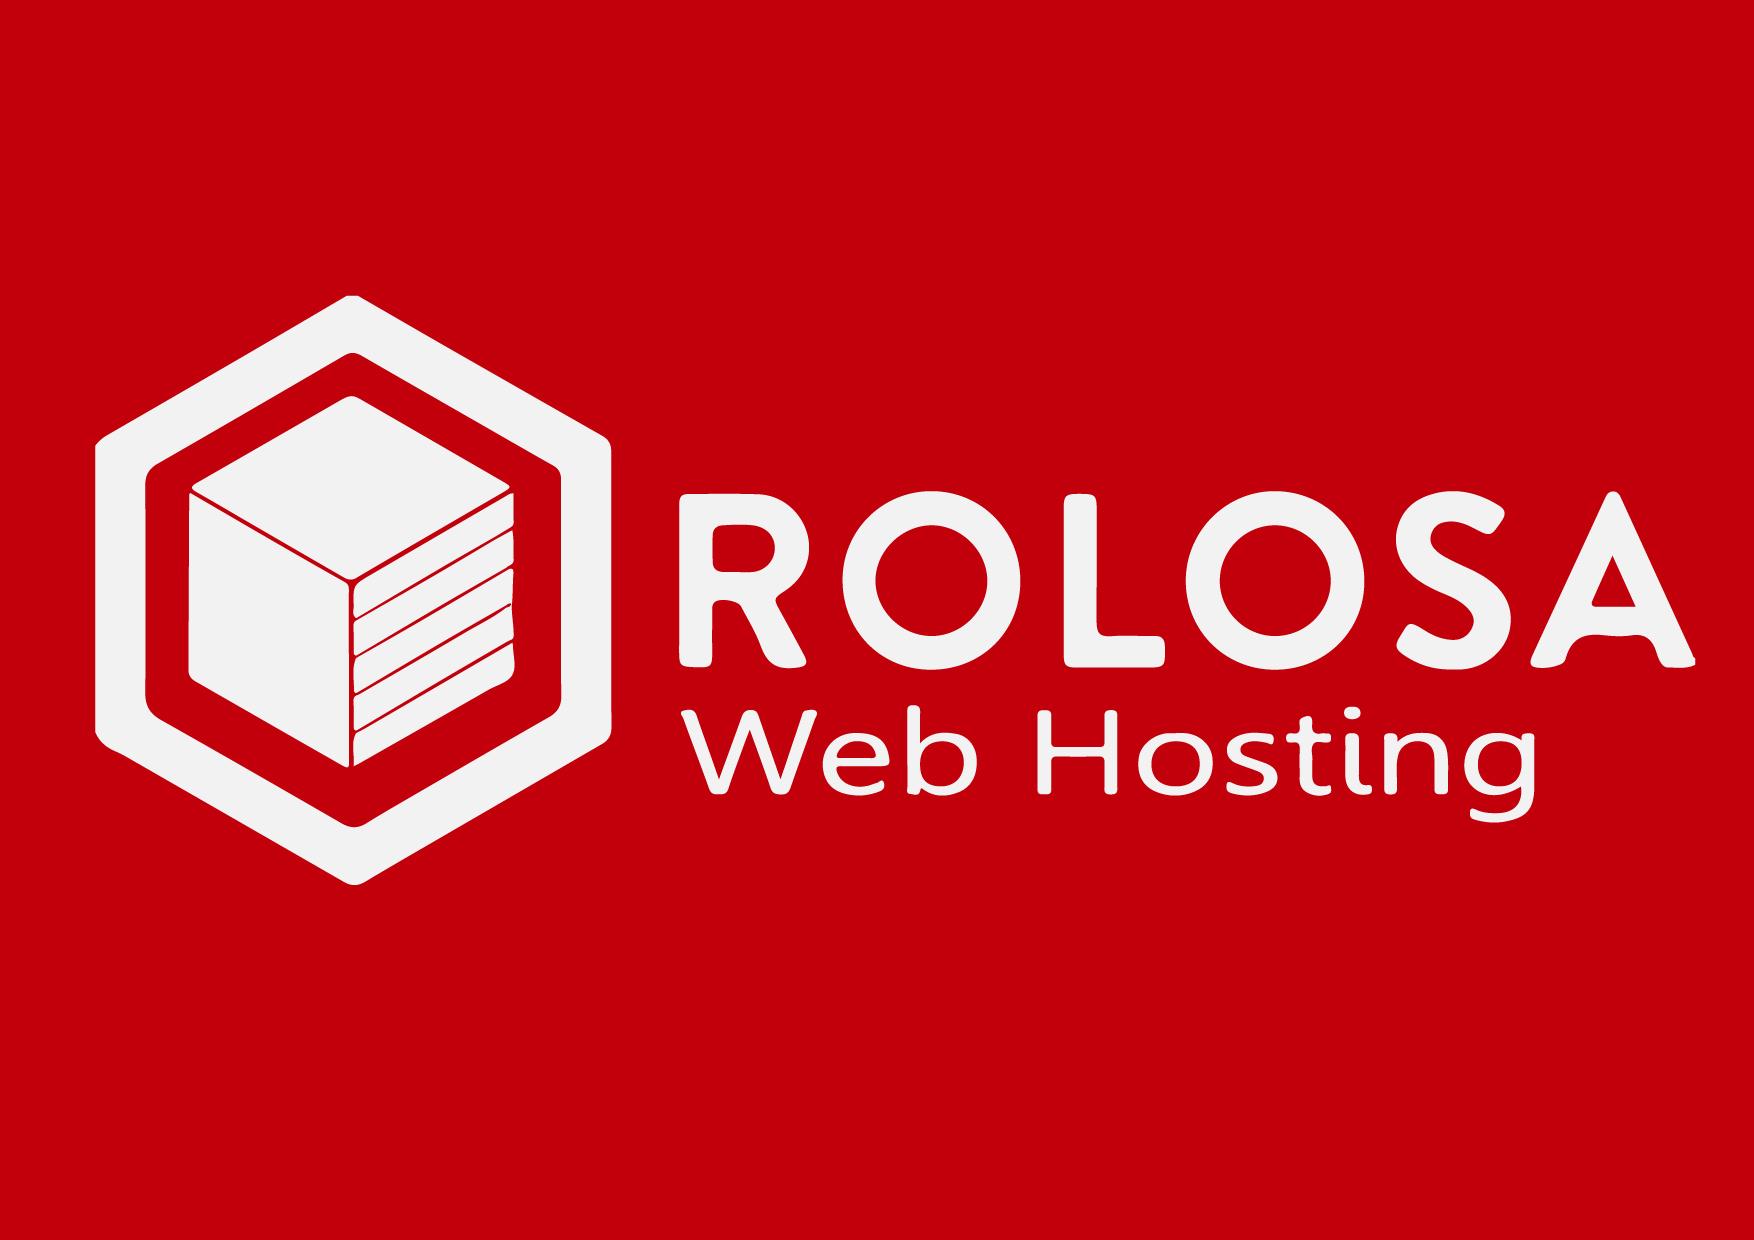 web_hosting_logo